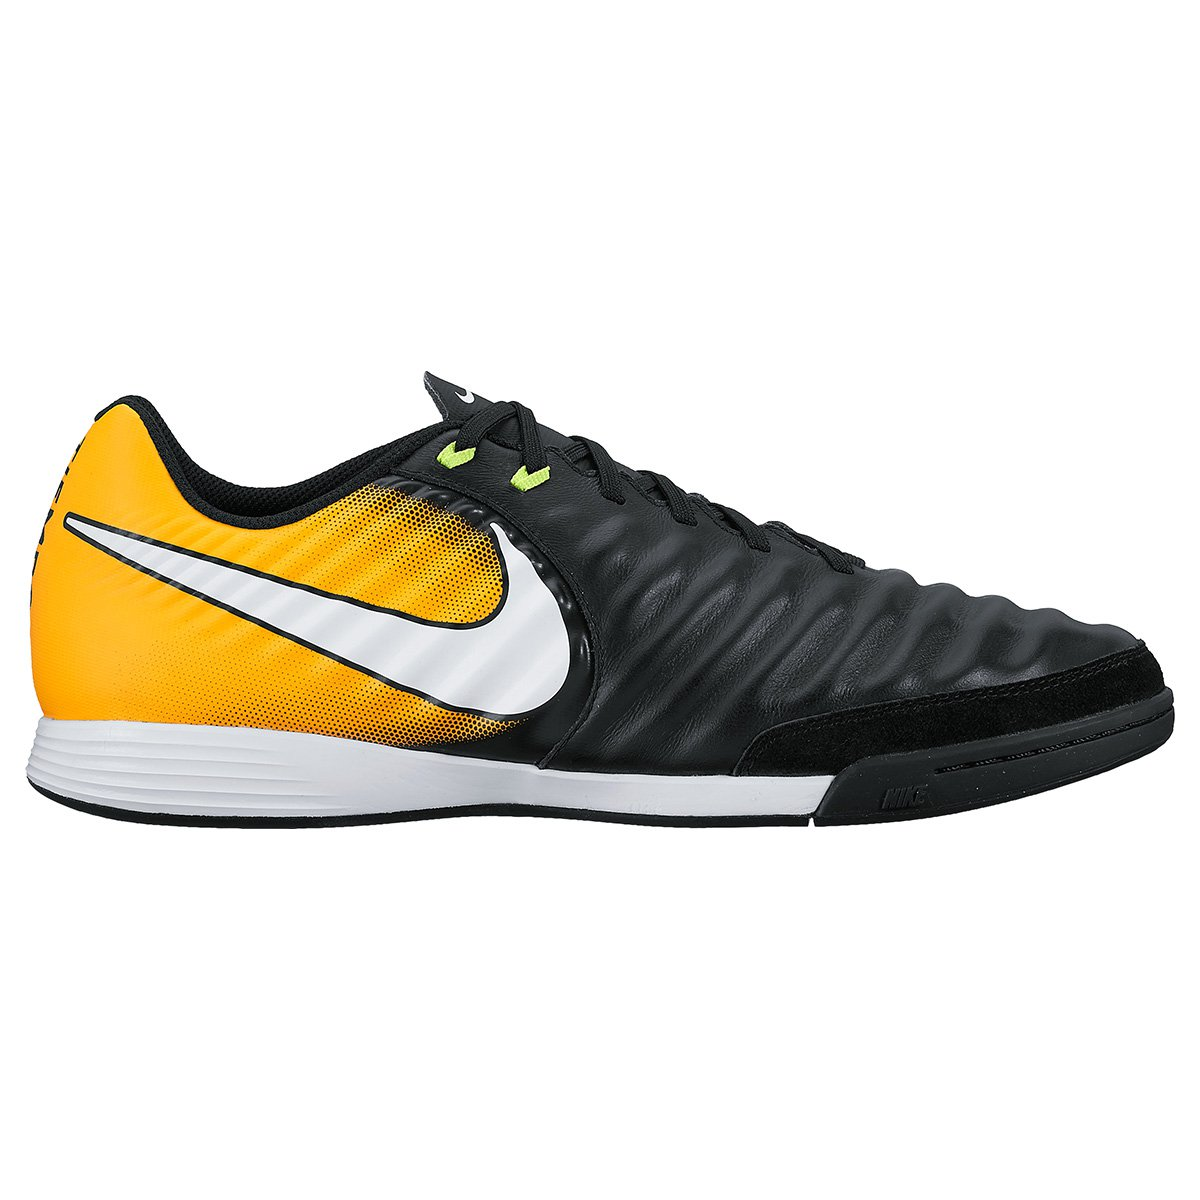 1af9ad6a2 Chuteira Futsal Nike Tiempo Ligera 4 IC - Preto e Laranja